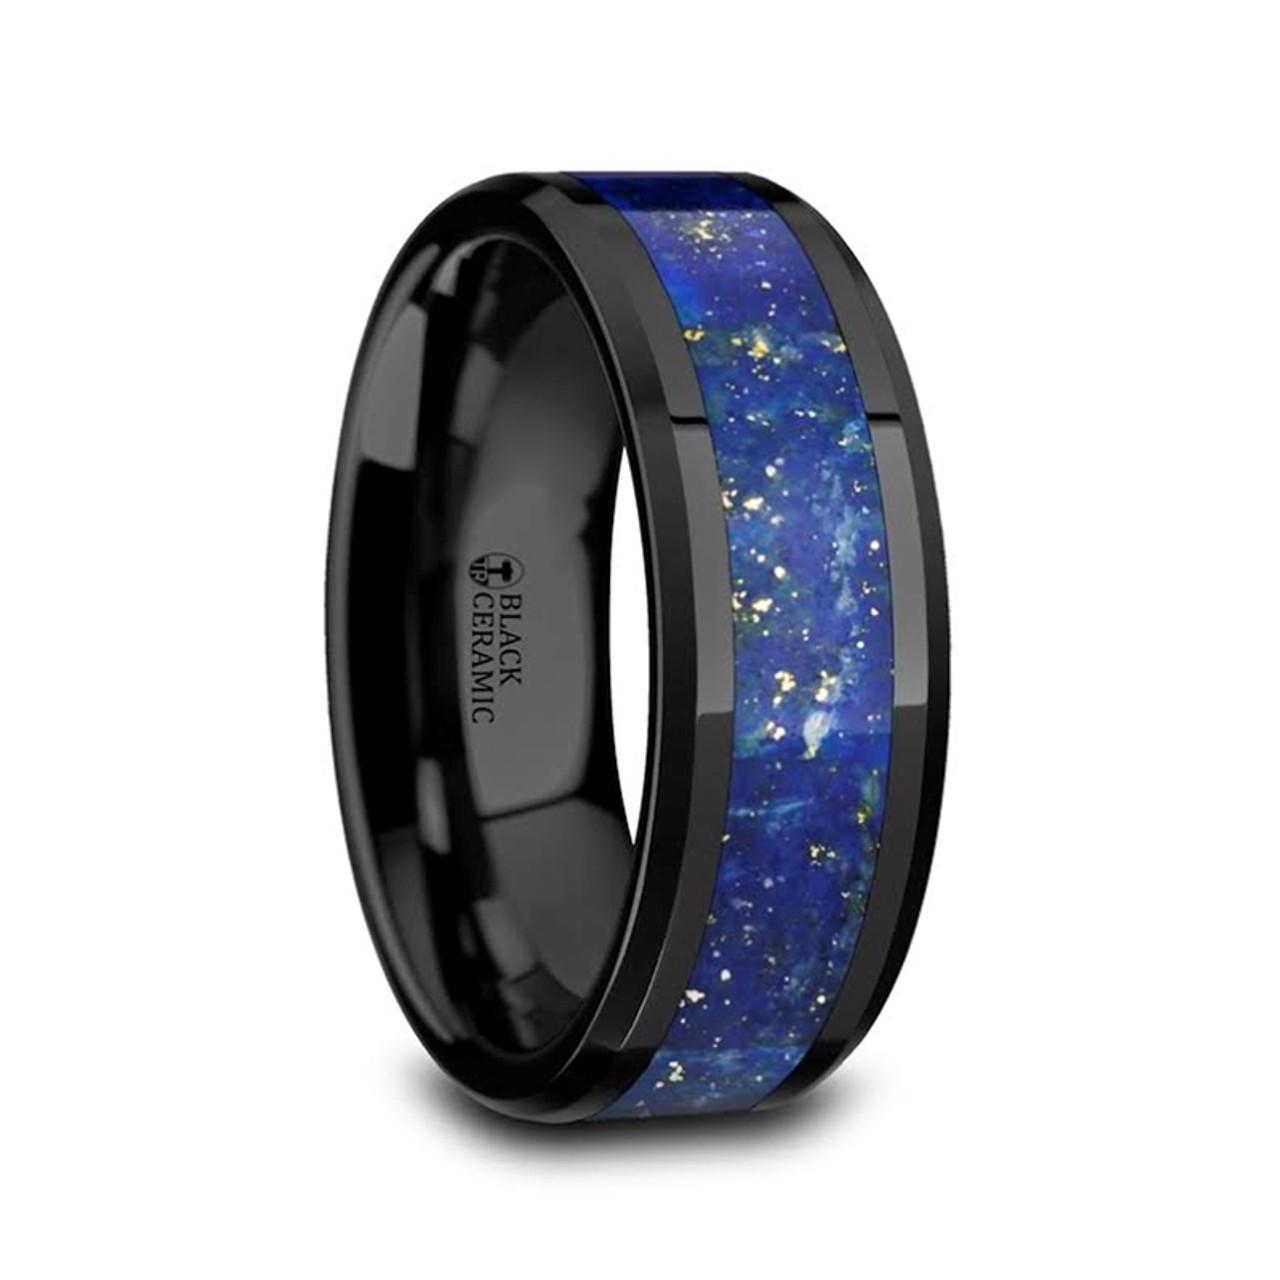 Argeius Men S Black Ceramic Wedding Band With Blue Lapis Inlay